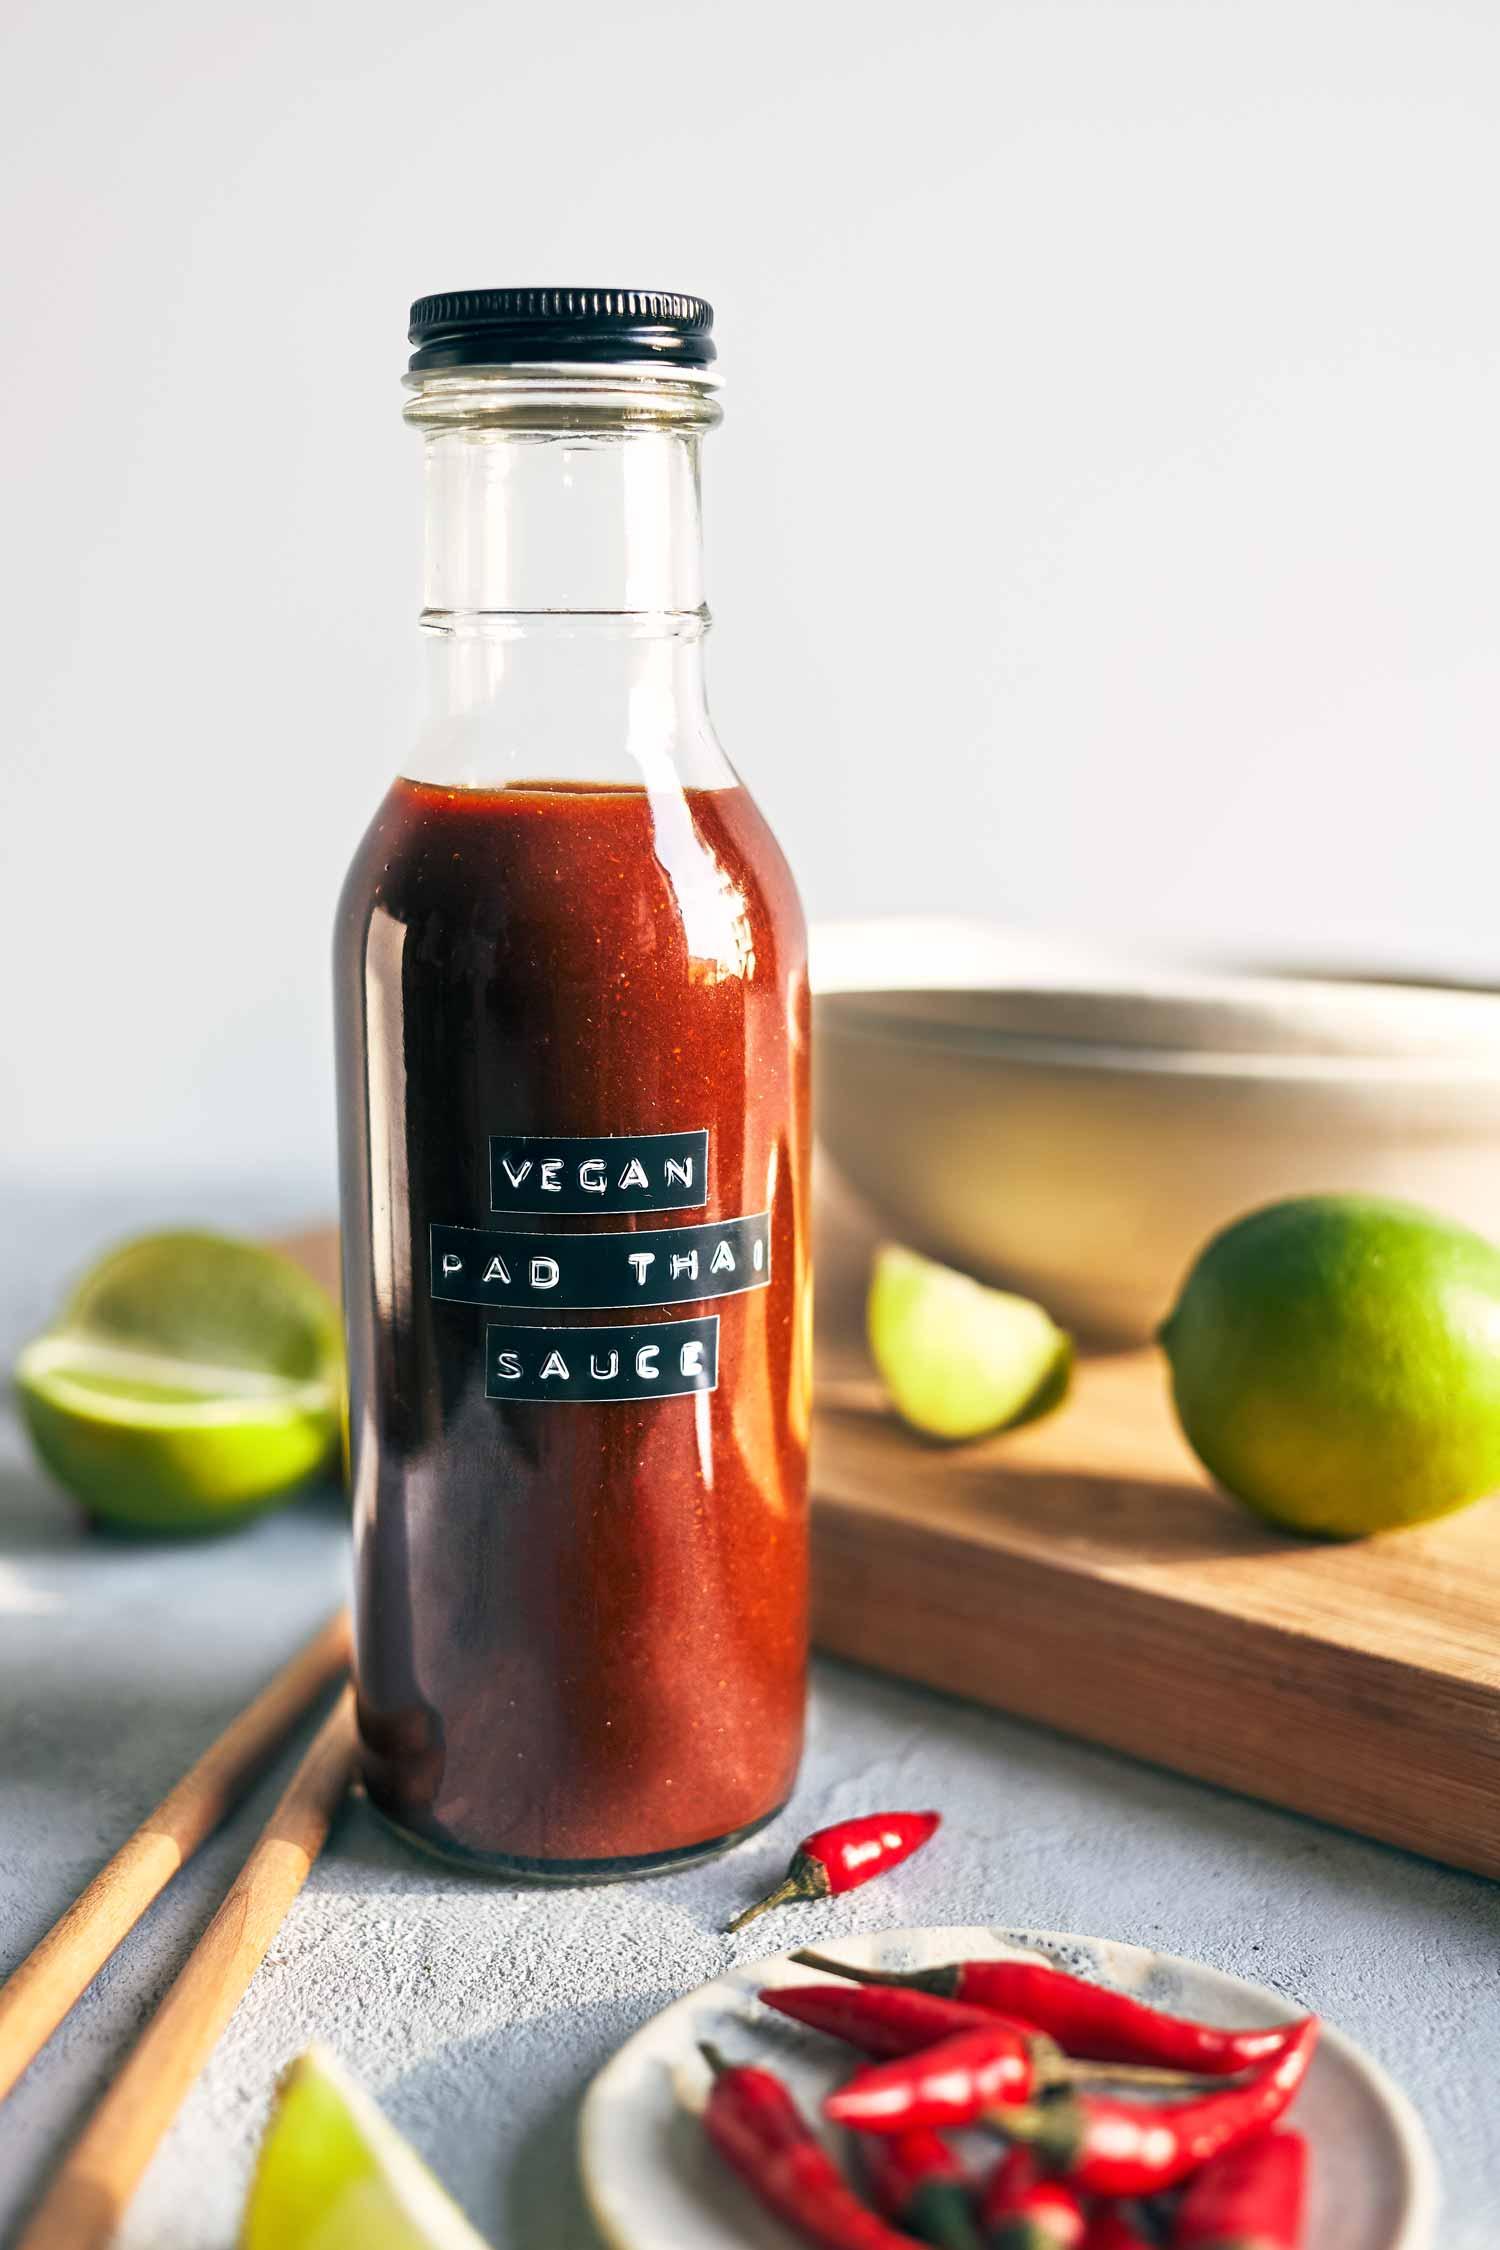 4 Ingredient Vegan Pad Thai Sauce | Evergreen Kitchen | Vegan & Gluten Free